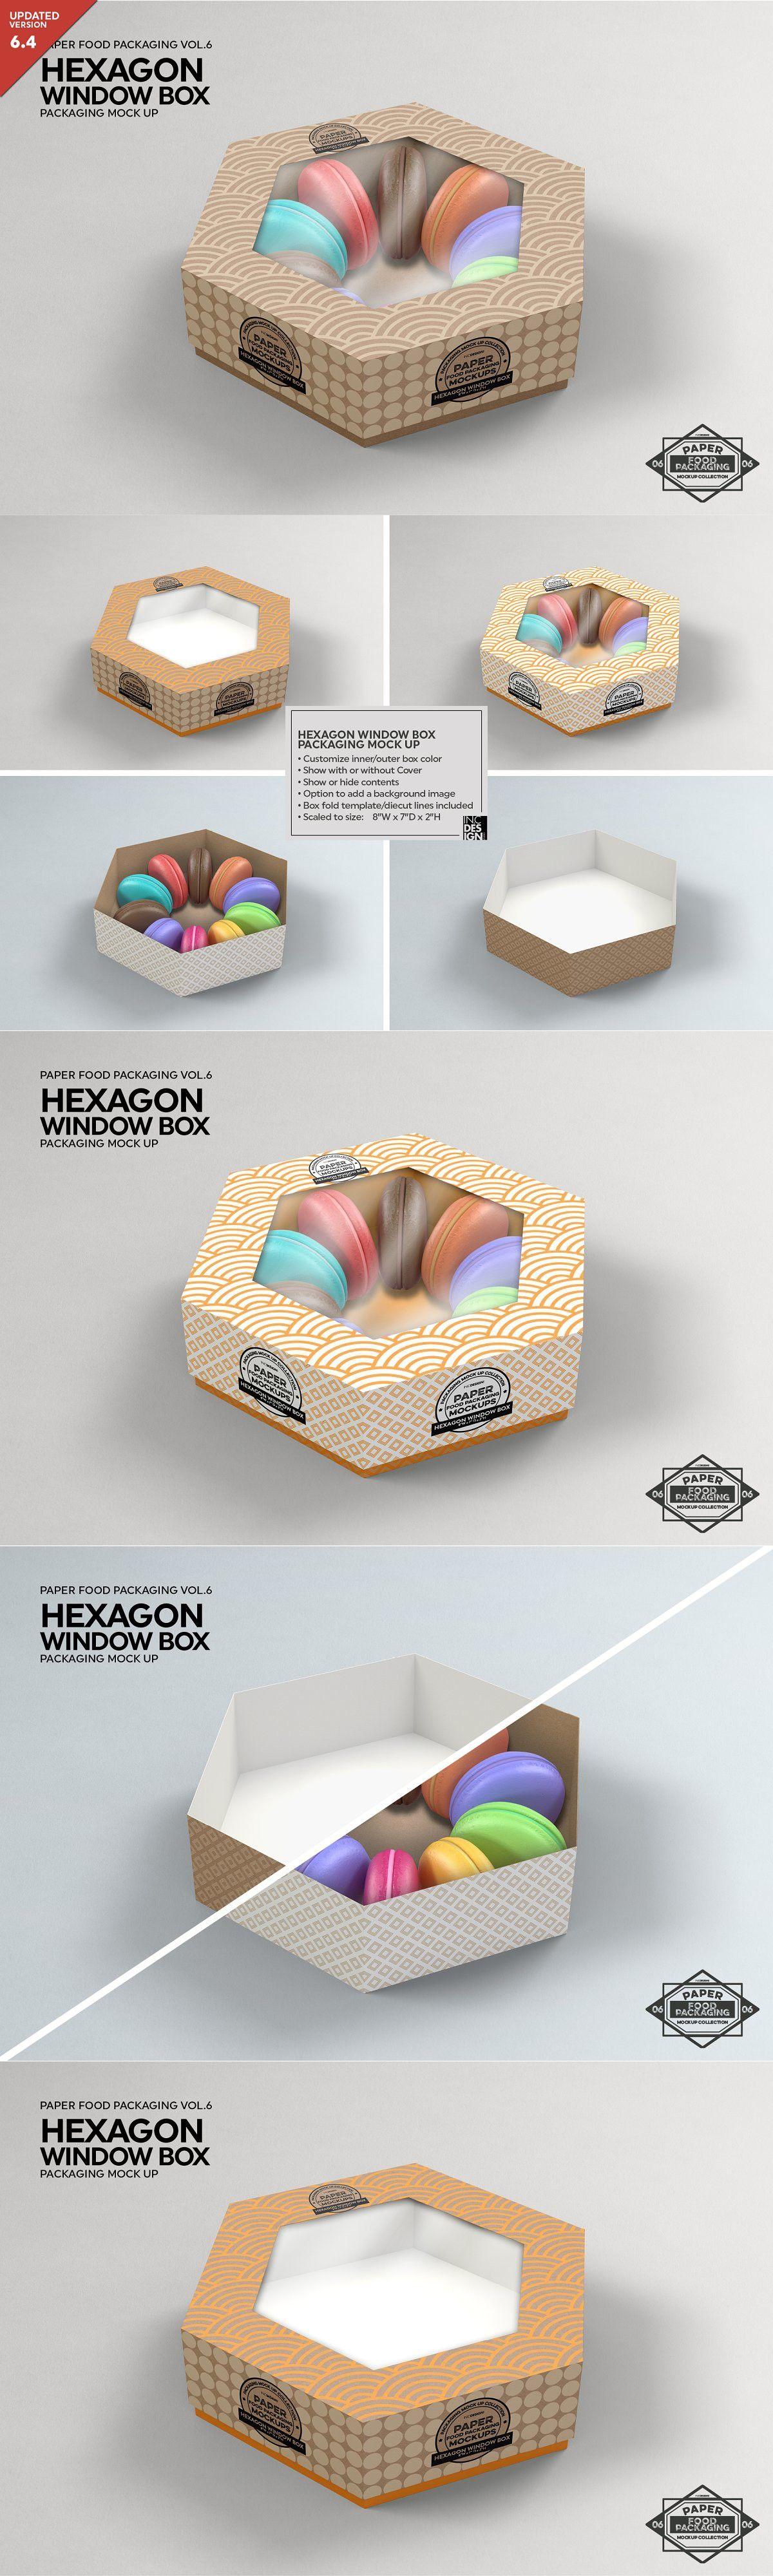 Download Hexagon Window Box Mockup Free Packaging Mockup Box Mockup Window Box